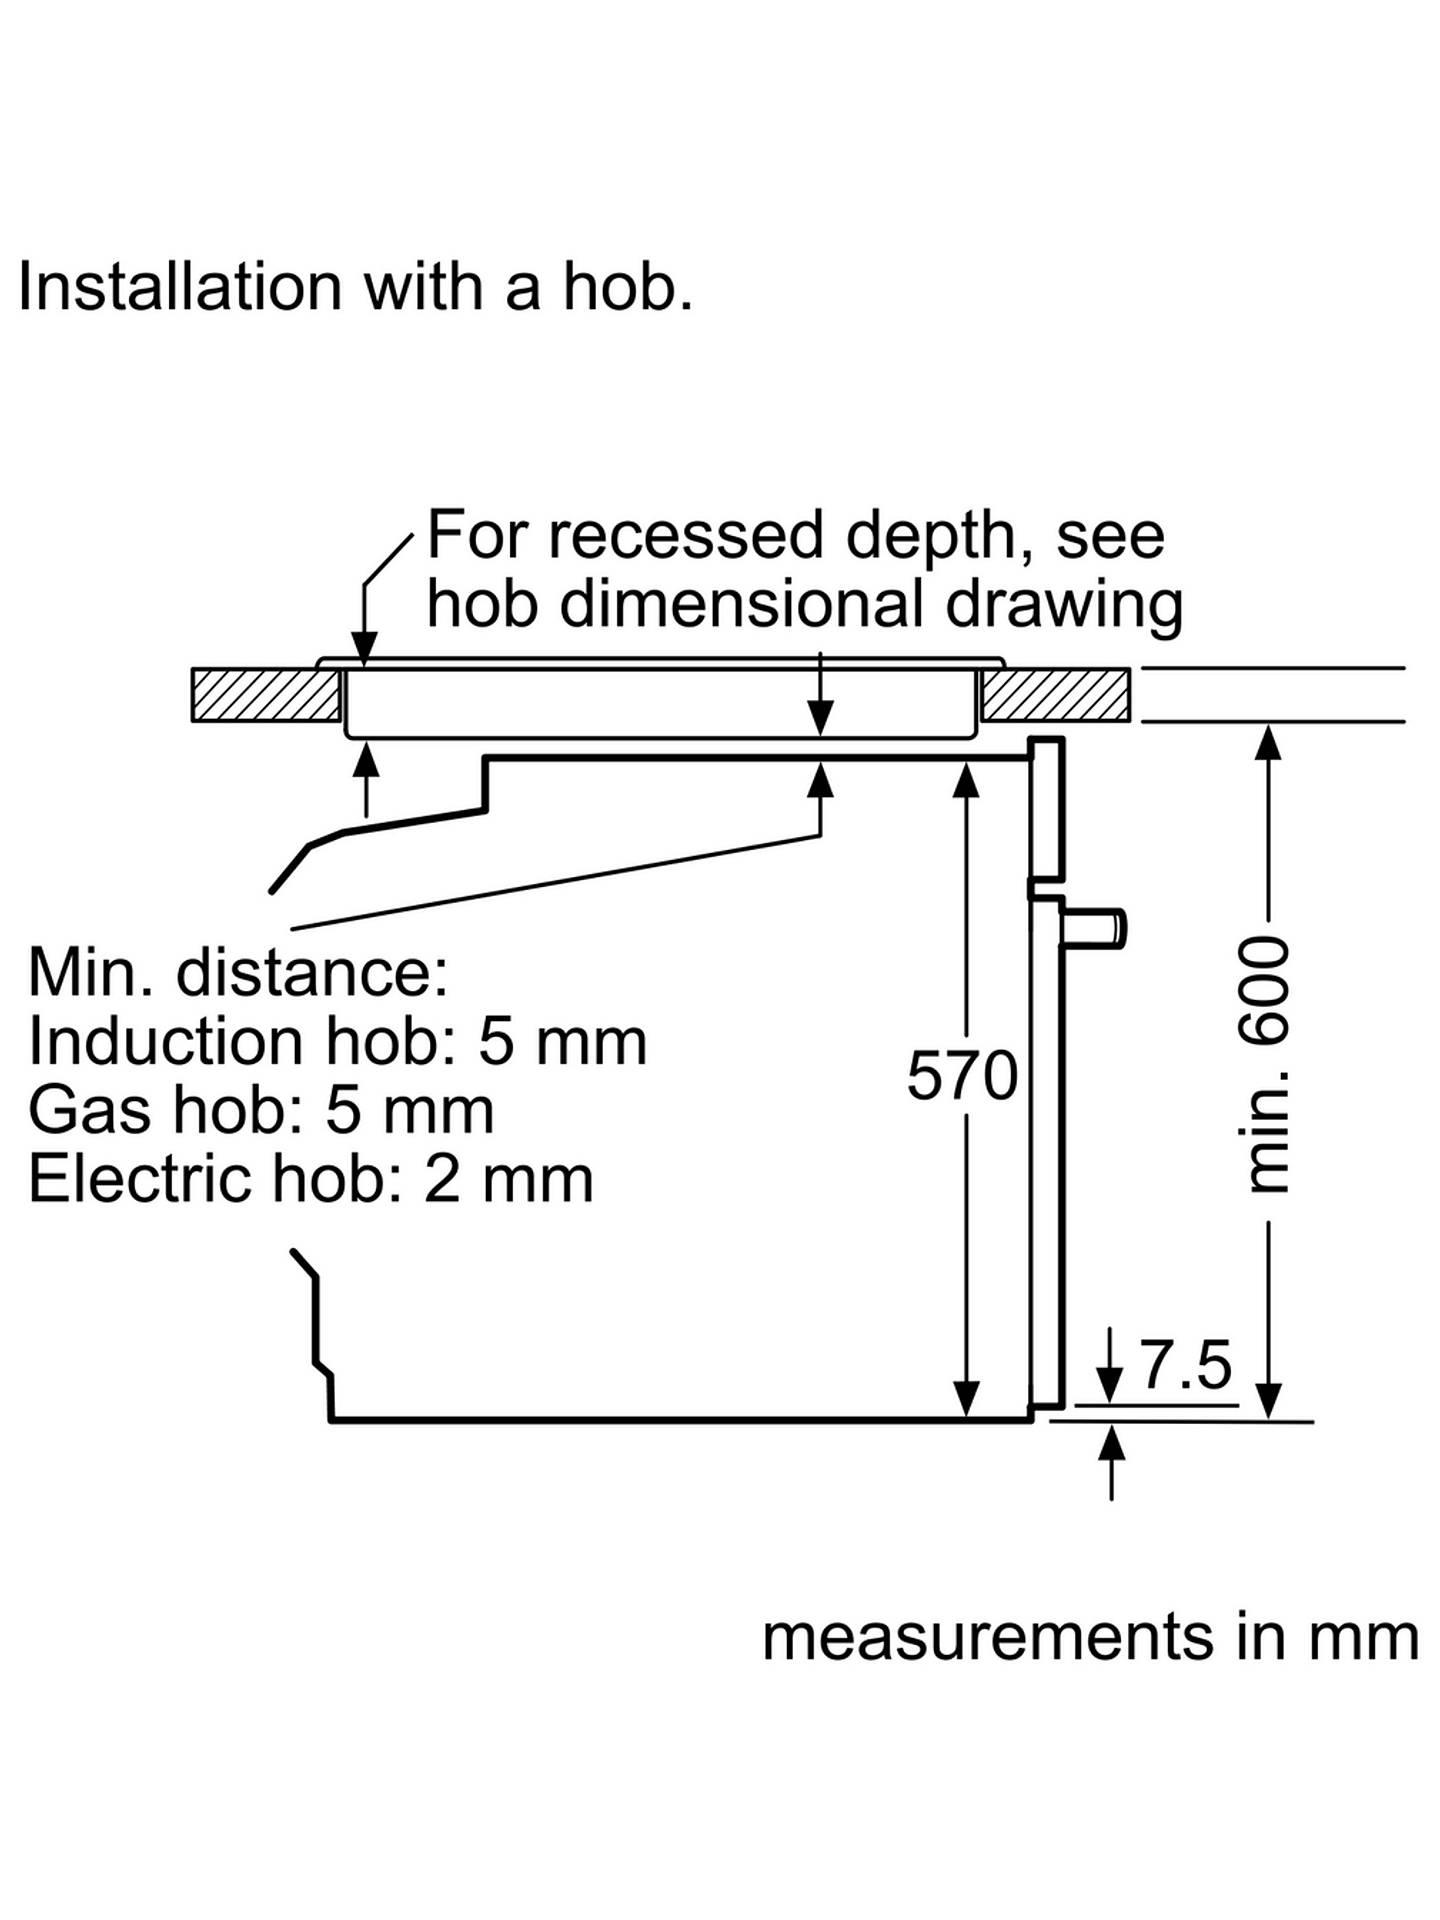 Bosch Hba5780s0b Built In Single Oven Stainless Steel At John Lewis Antler Lamp Wiring Kit Buybosch Online